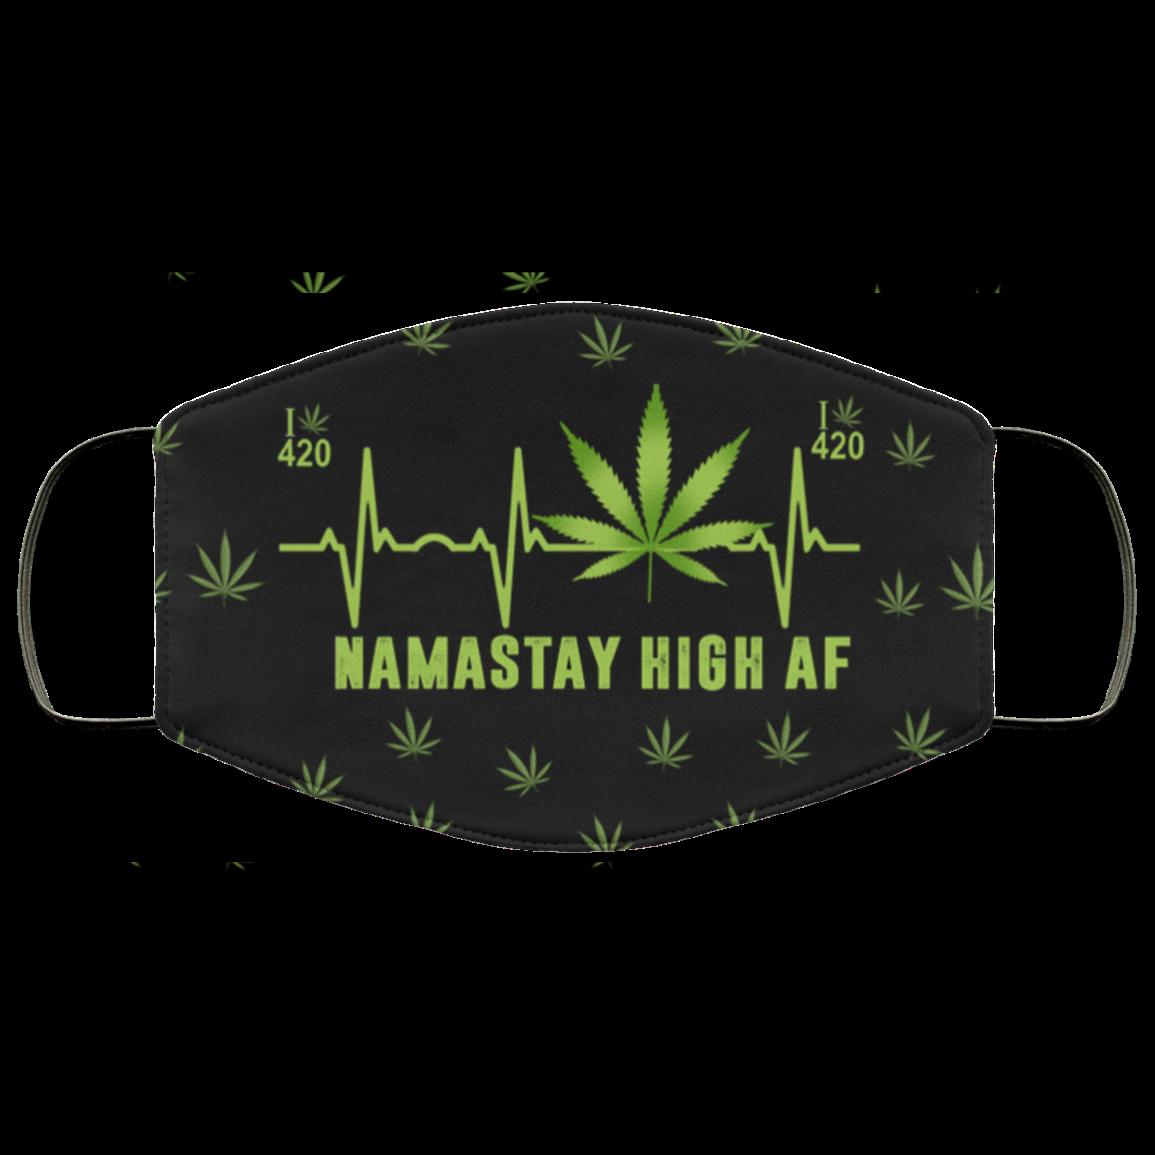 Namastay High AF 420 Cannabis Face Mask